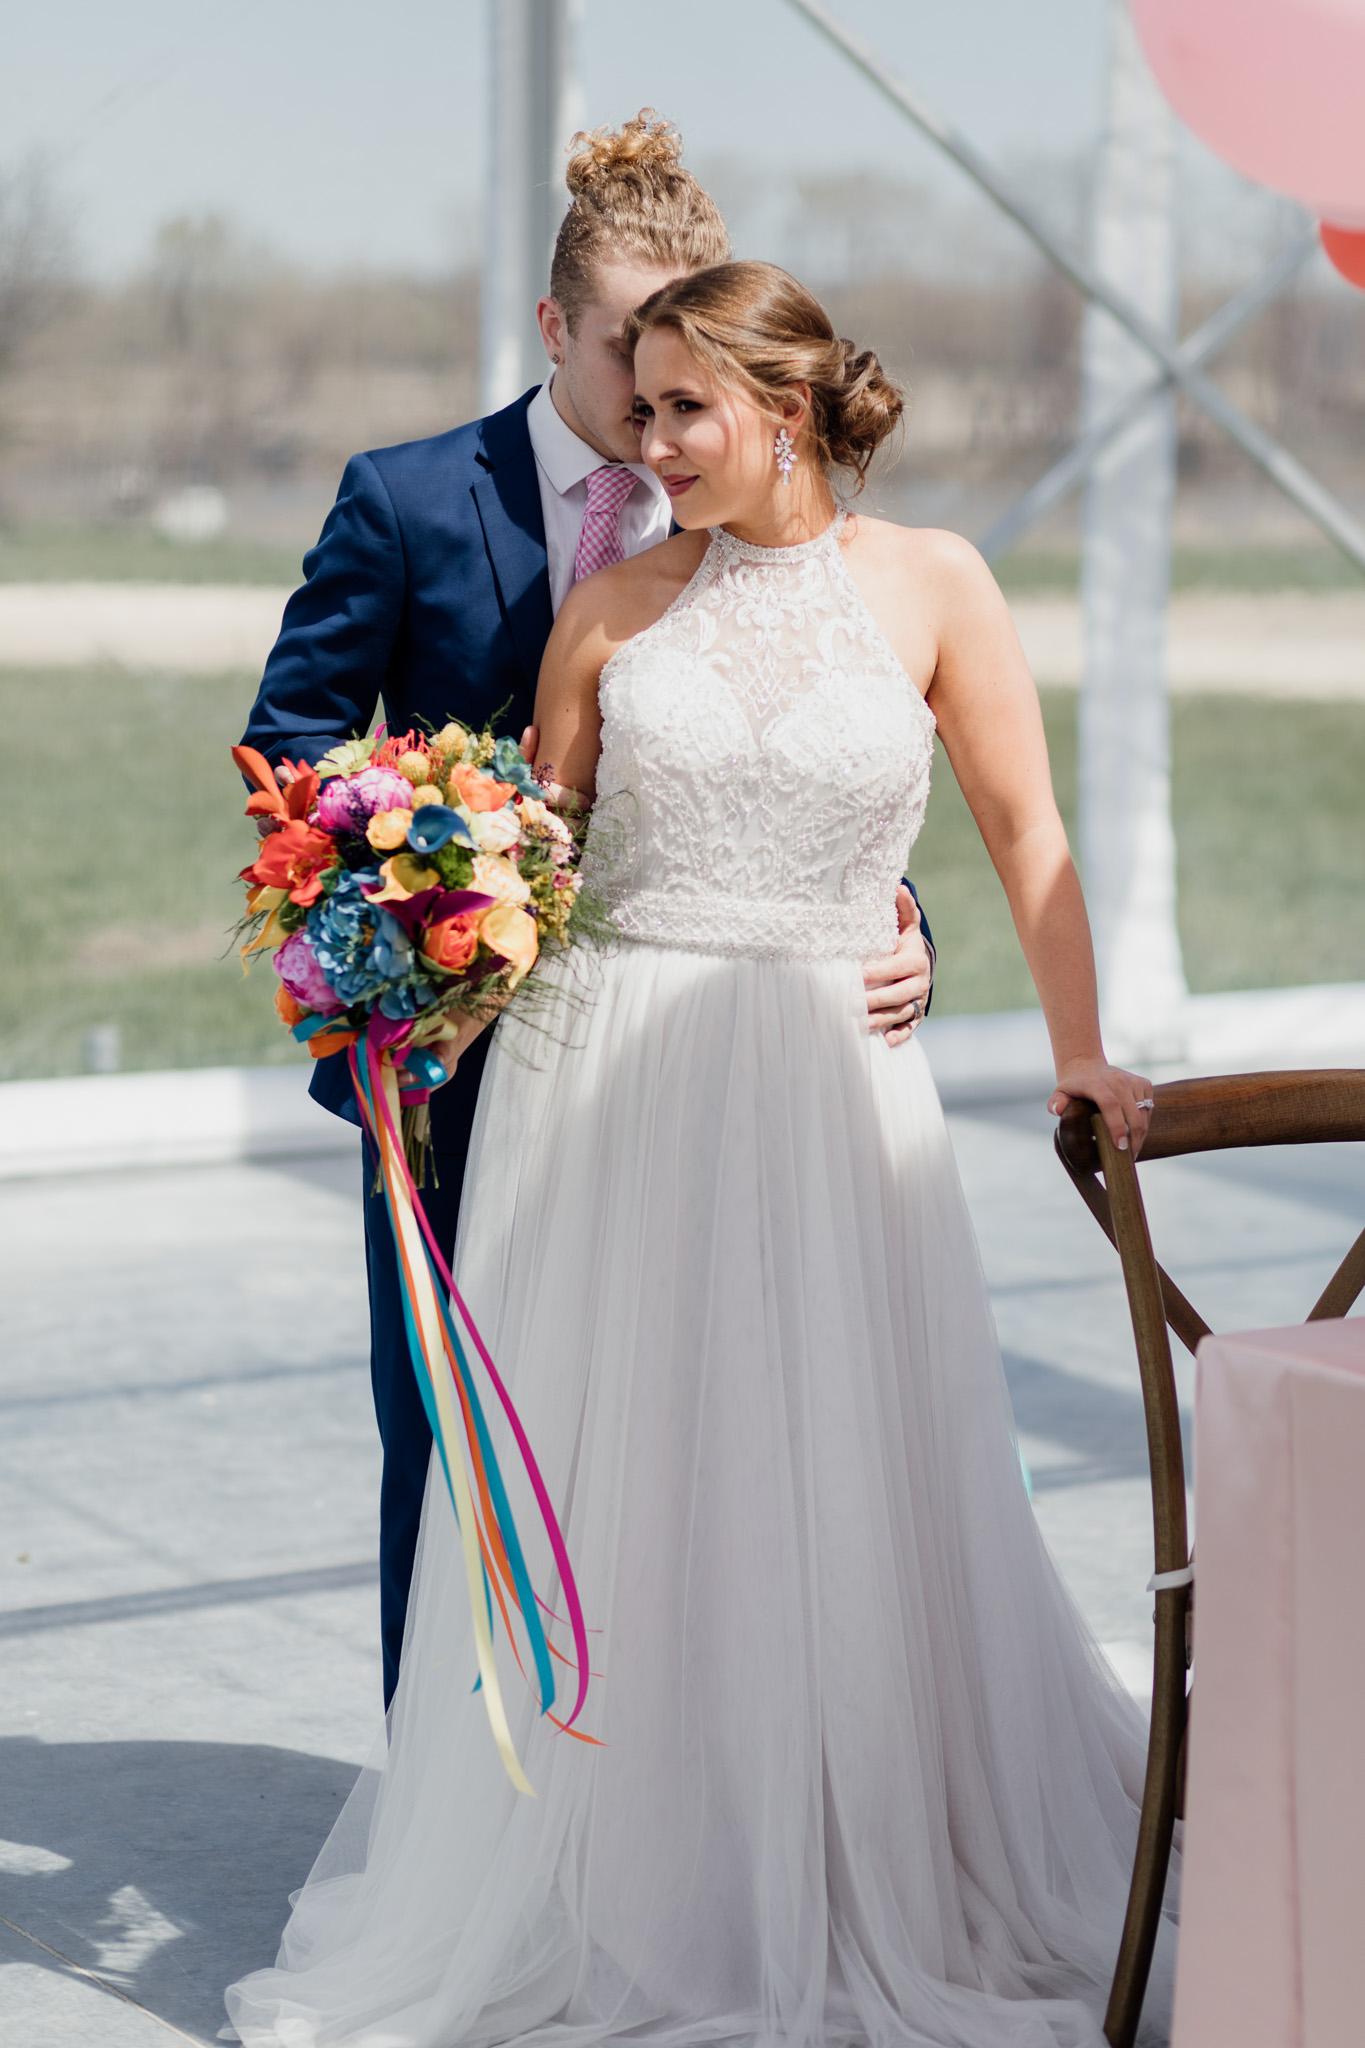 winnipeg-wedding-starlit point-35.jpg